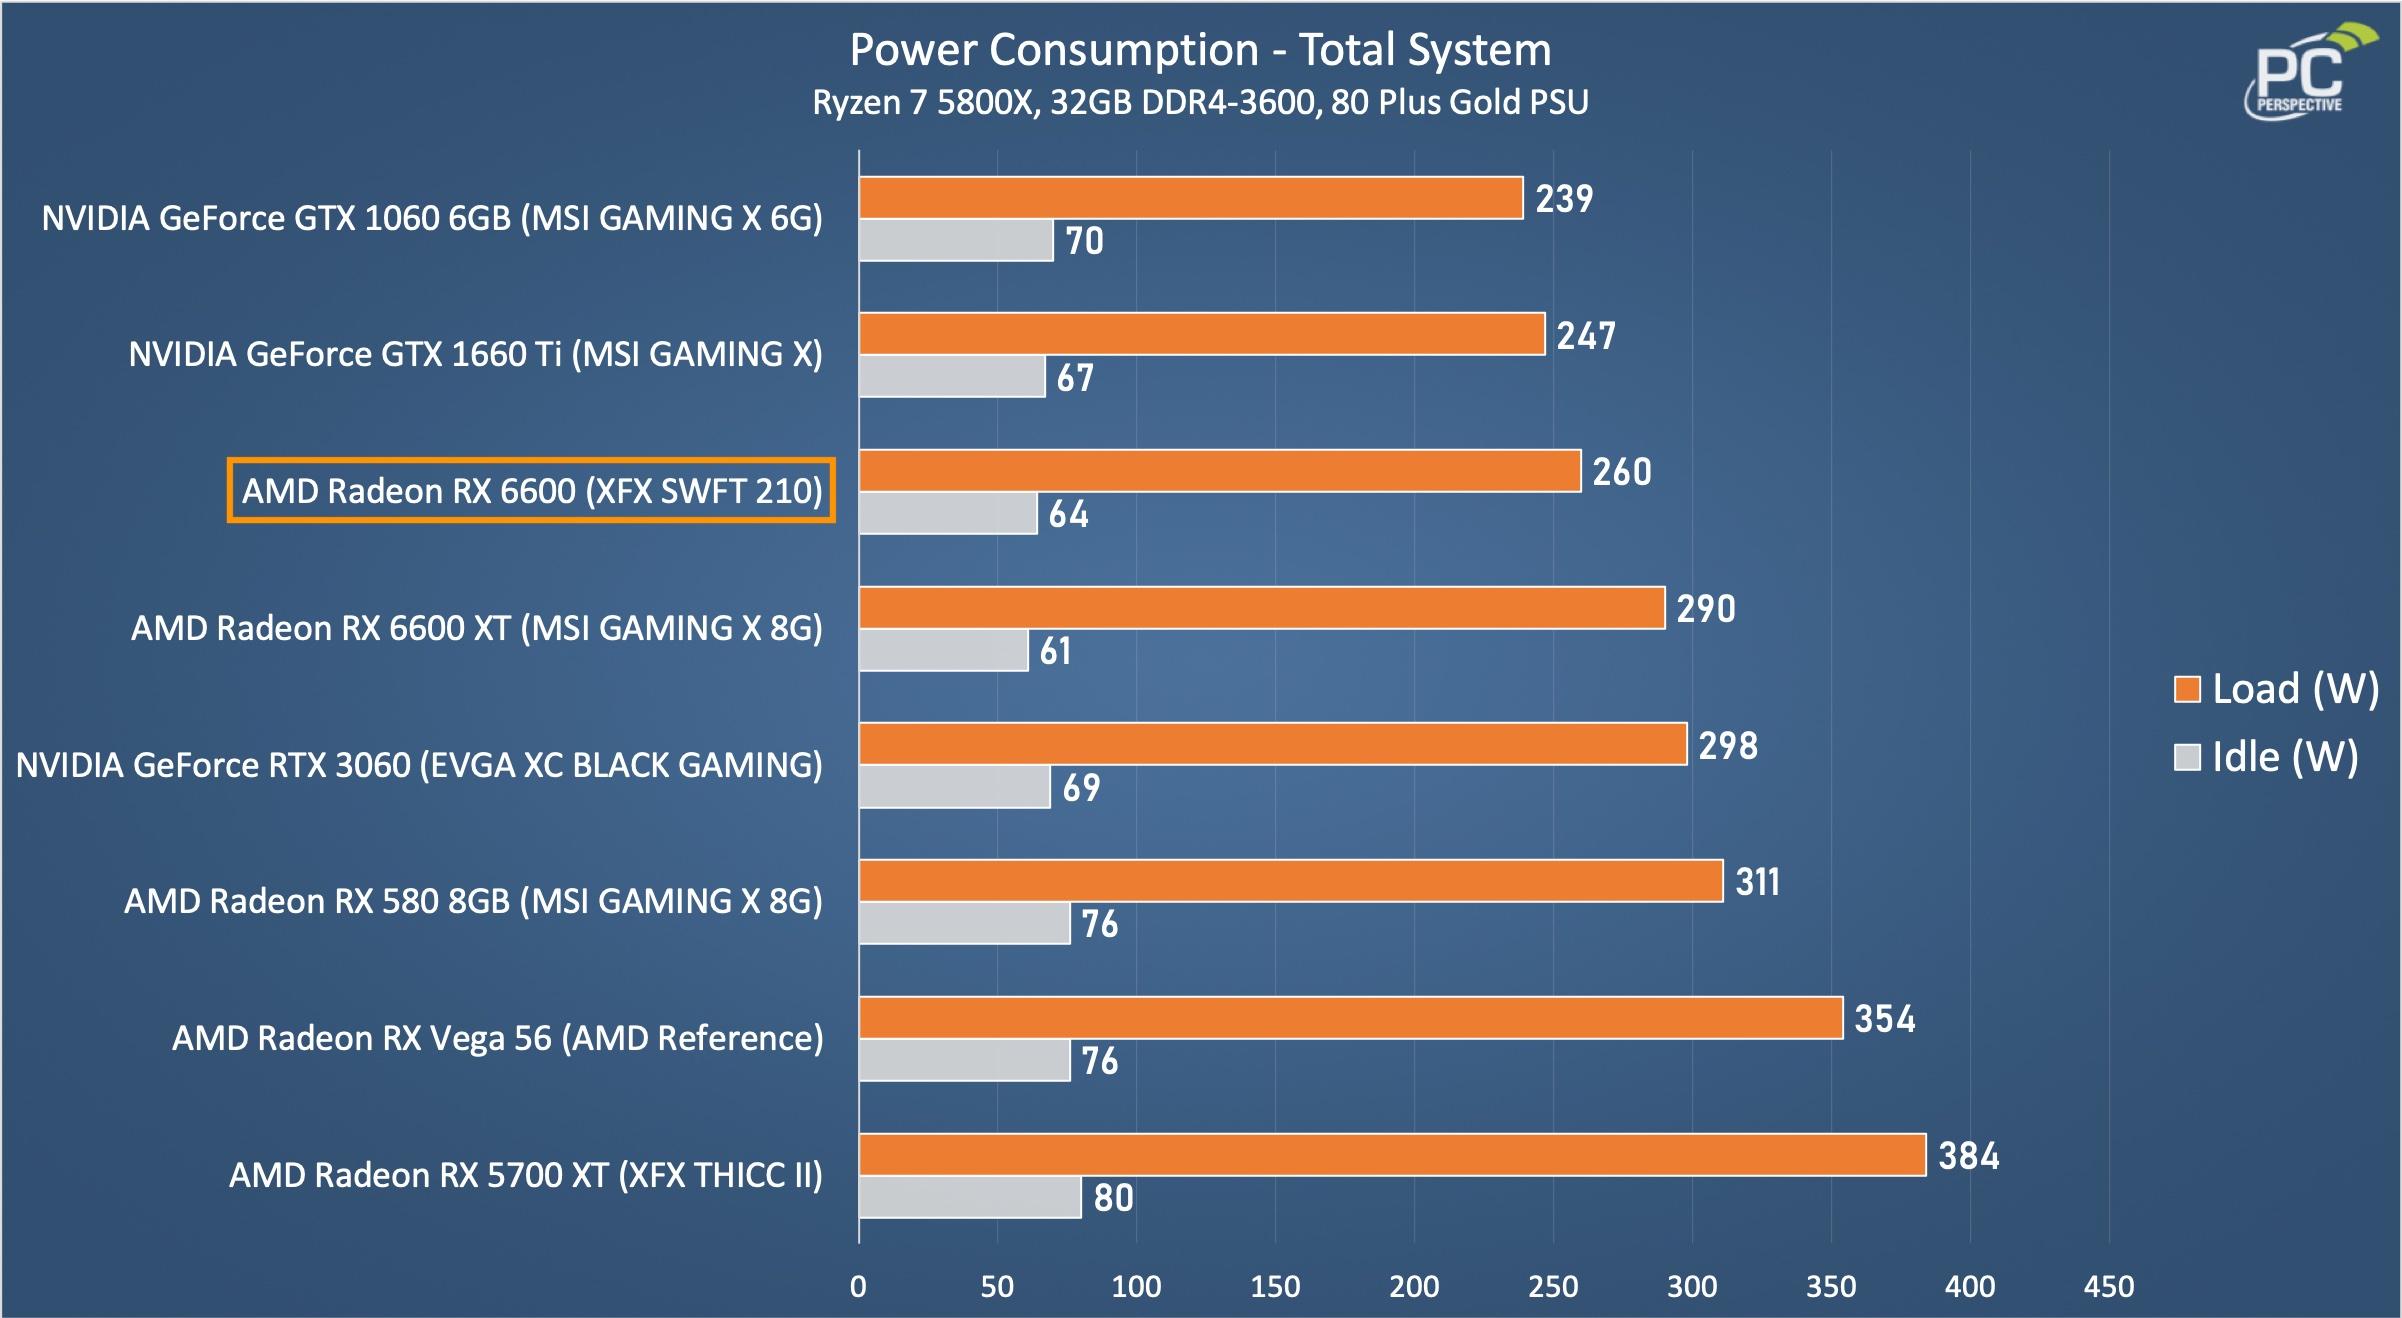 RX 6600 XFX SWFT 210 Power Chart